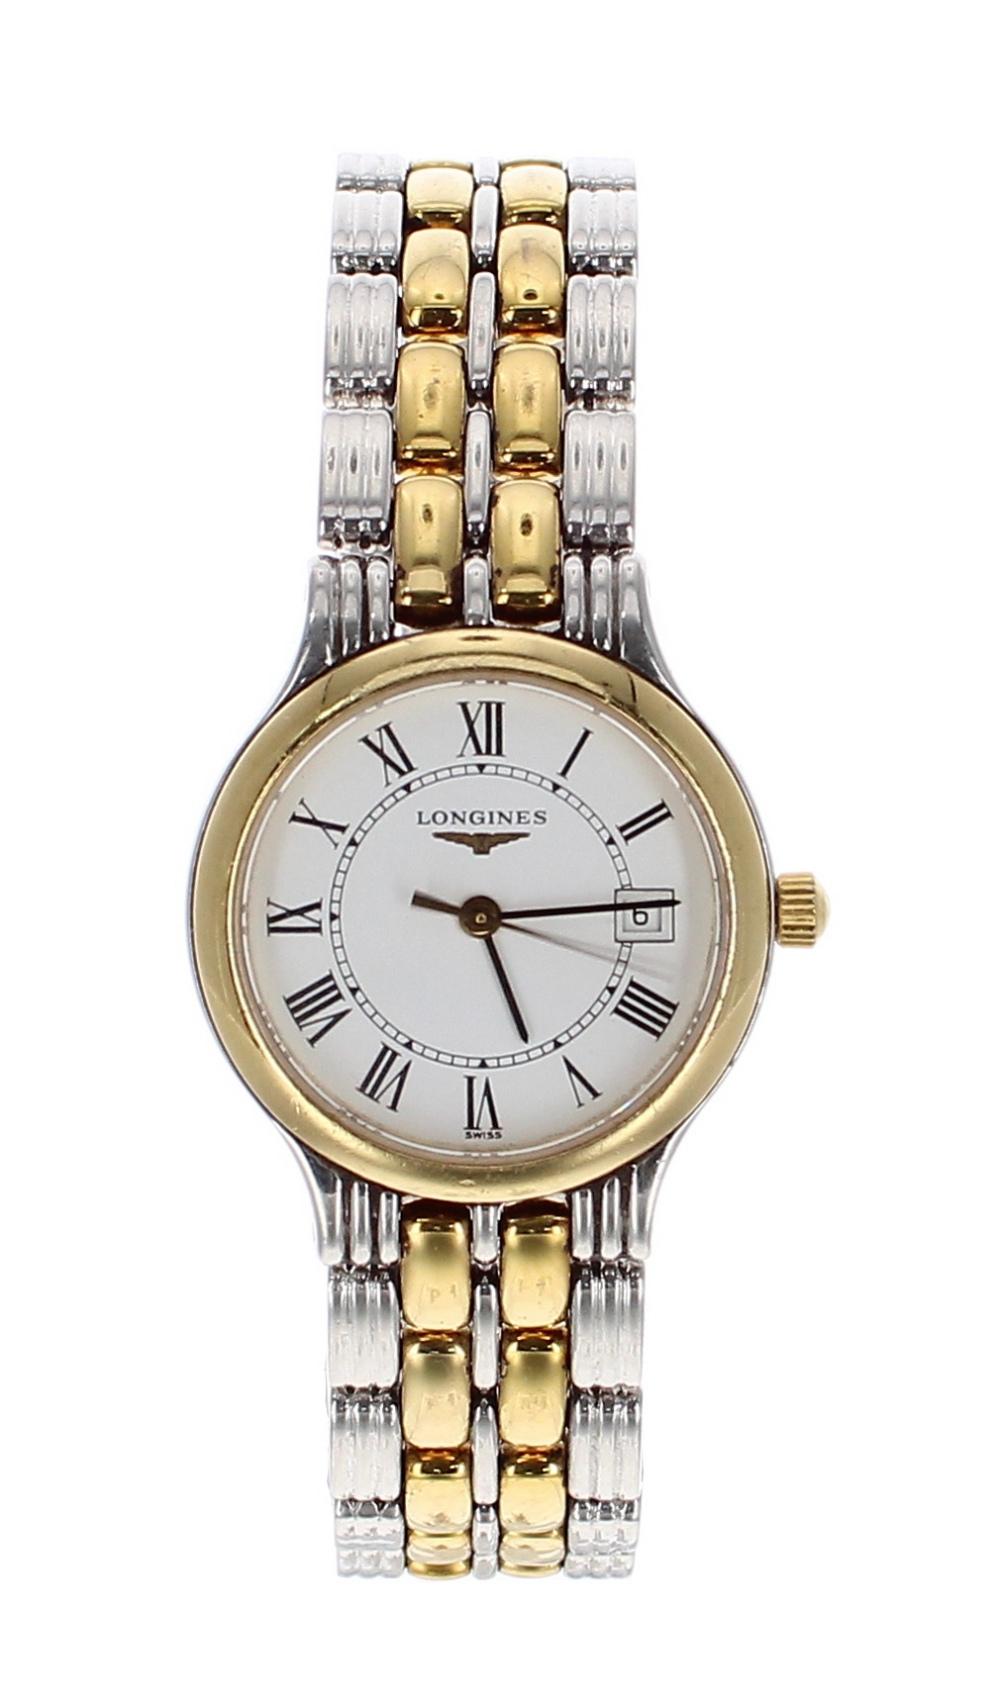 Lot 60 - Longines Presence bicolour lady's bracelet watch, ref. L5 149 3, circular white dial with Roman